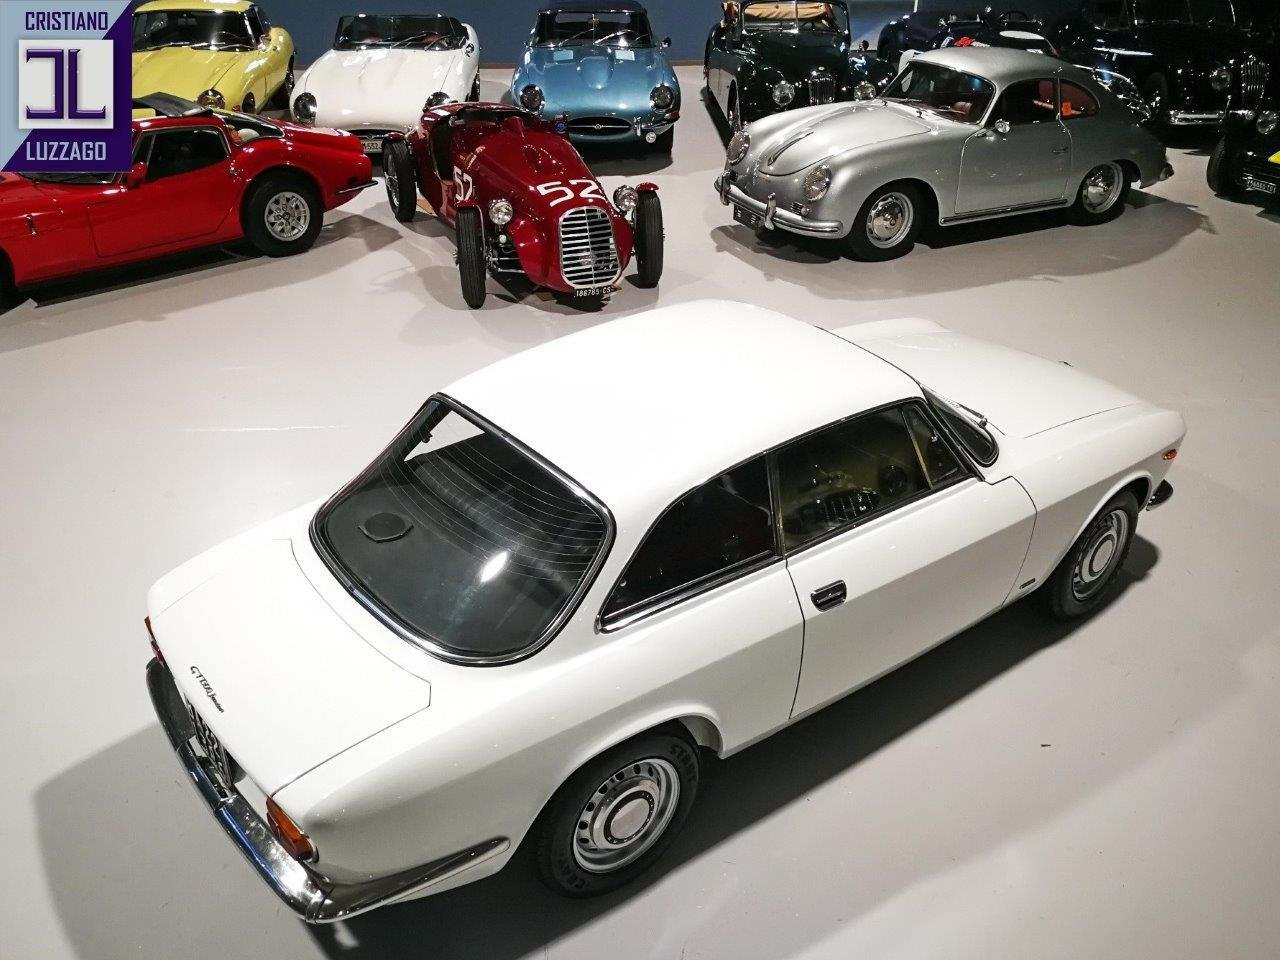 1968 ALFA ROMEO GT JUNIOR 1300 SCALINO SOLD (picture 2 of 6)